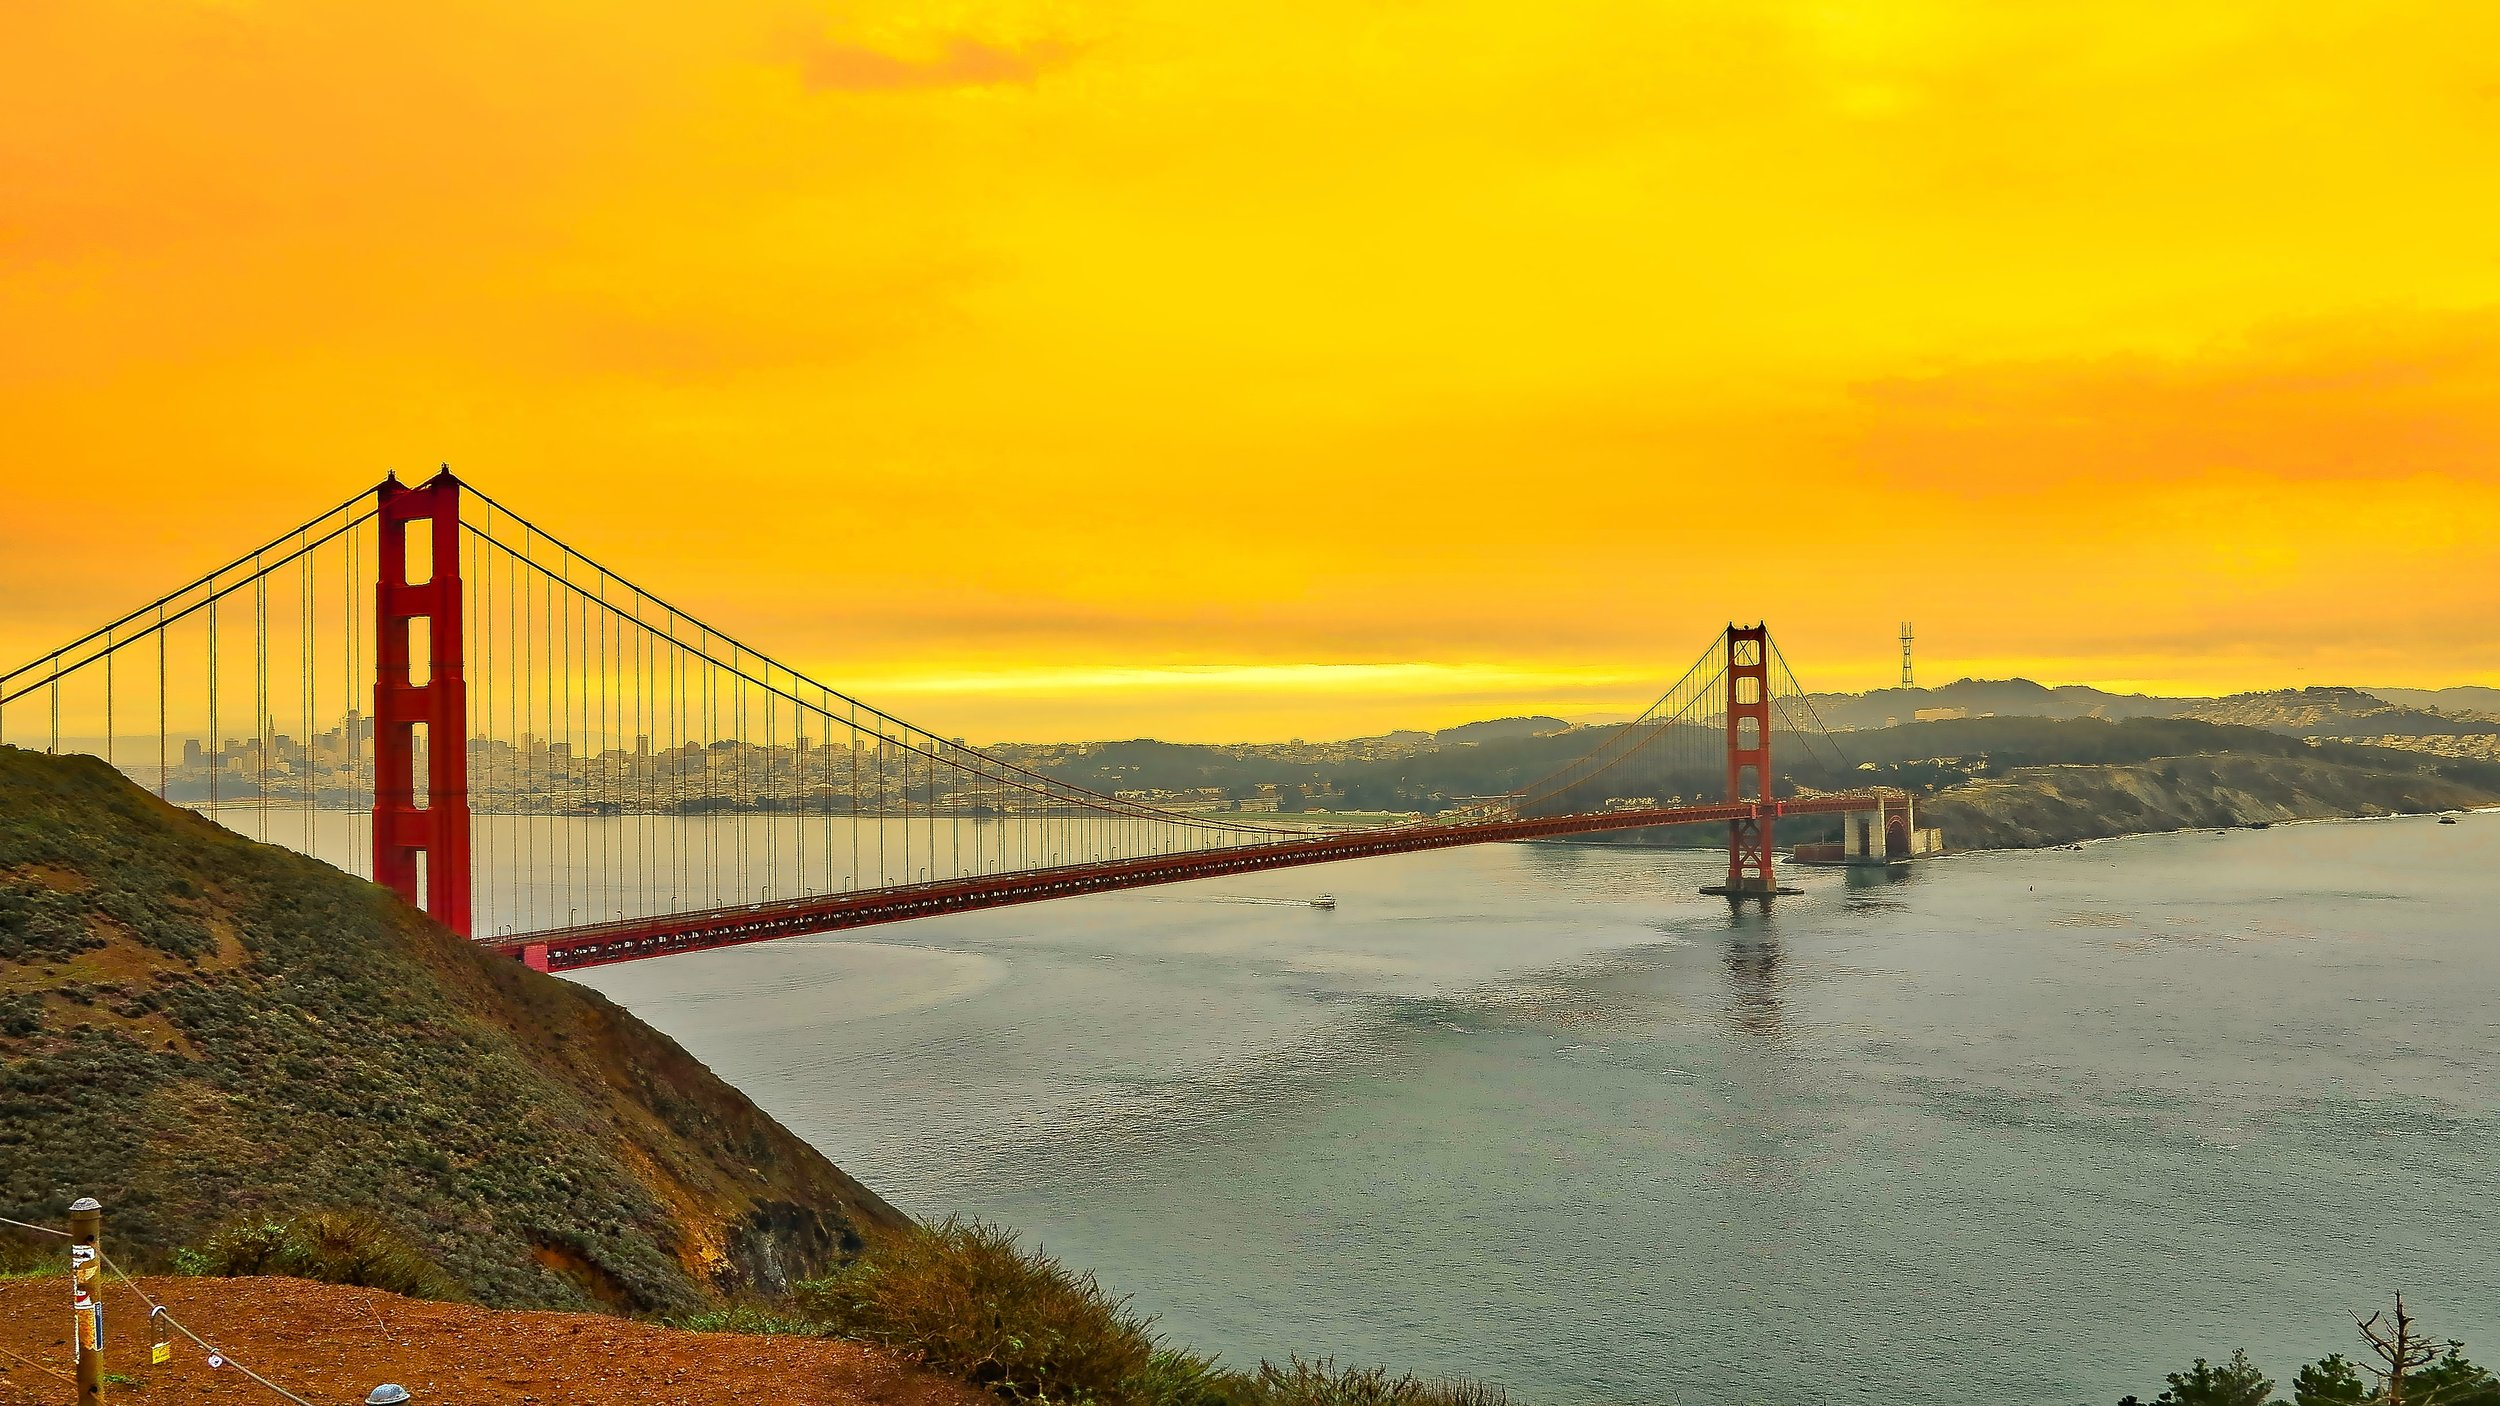 bay-bridge-california-449608.jpg